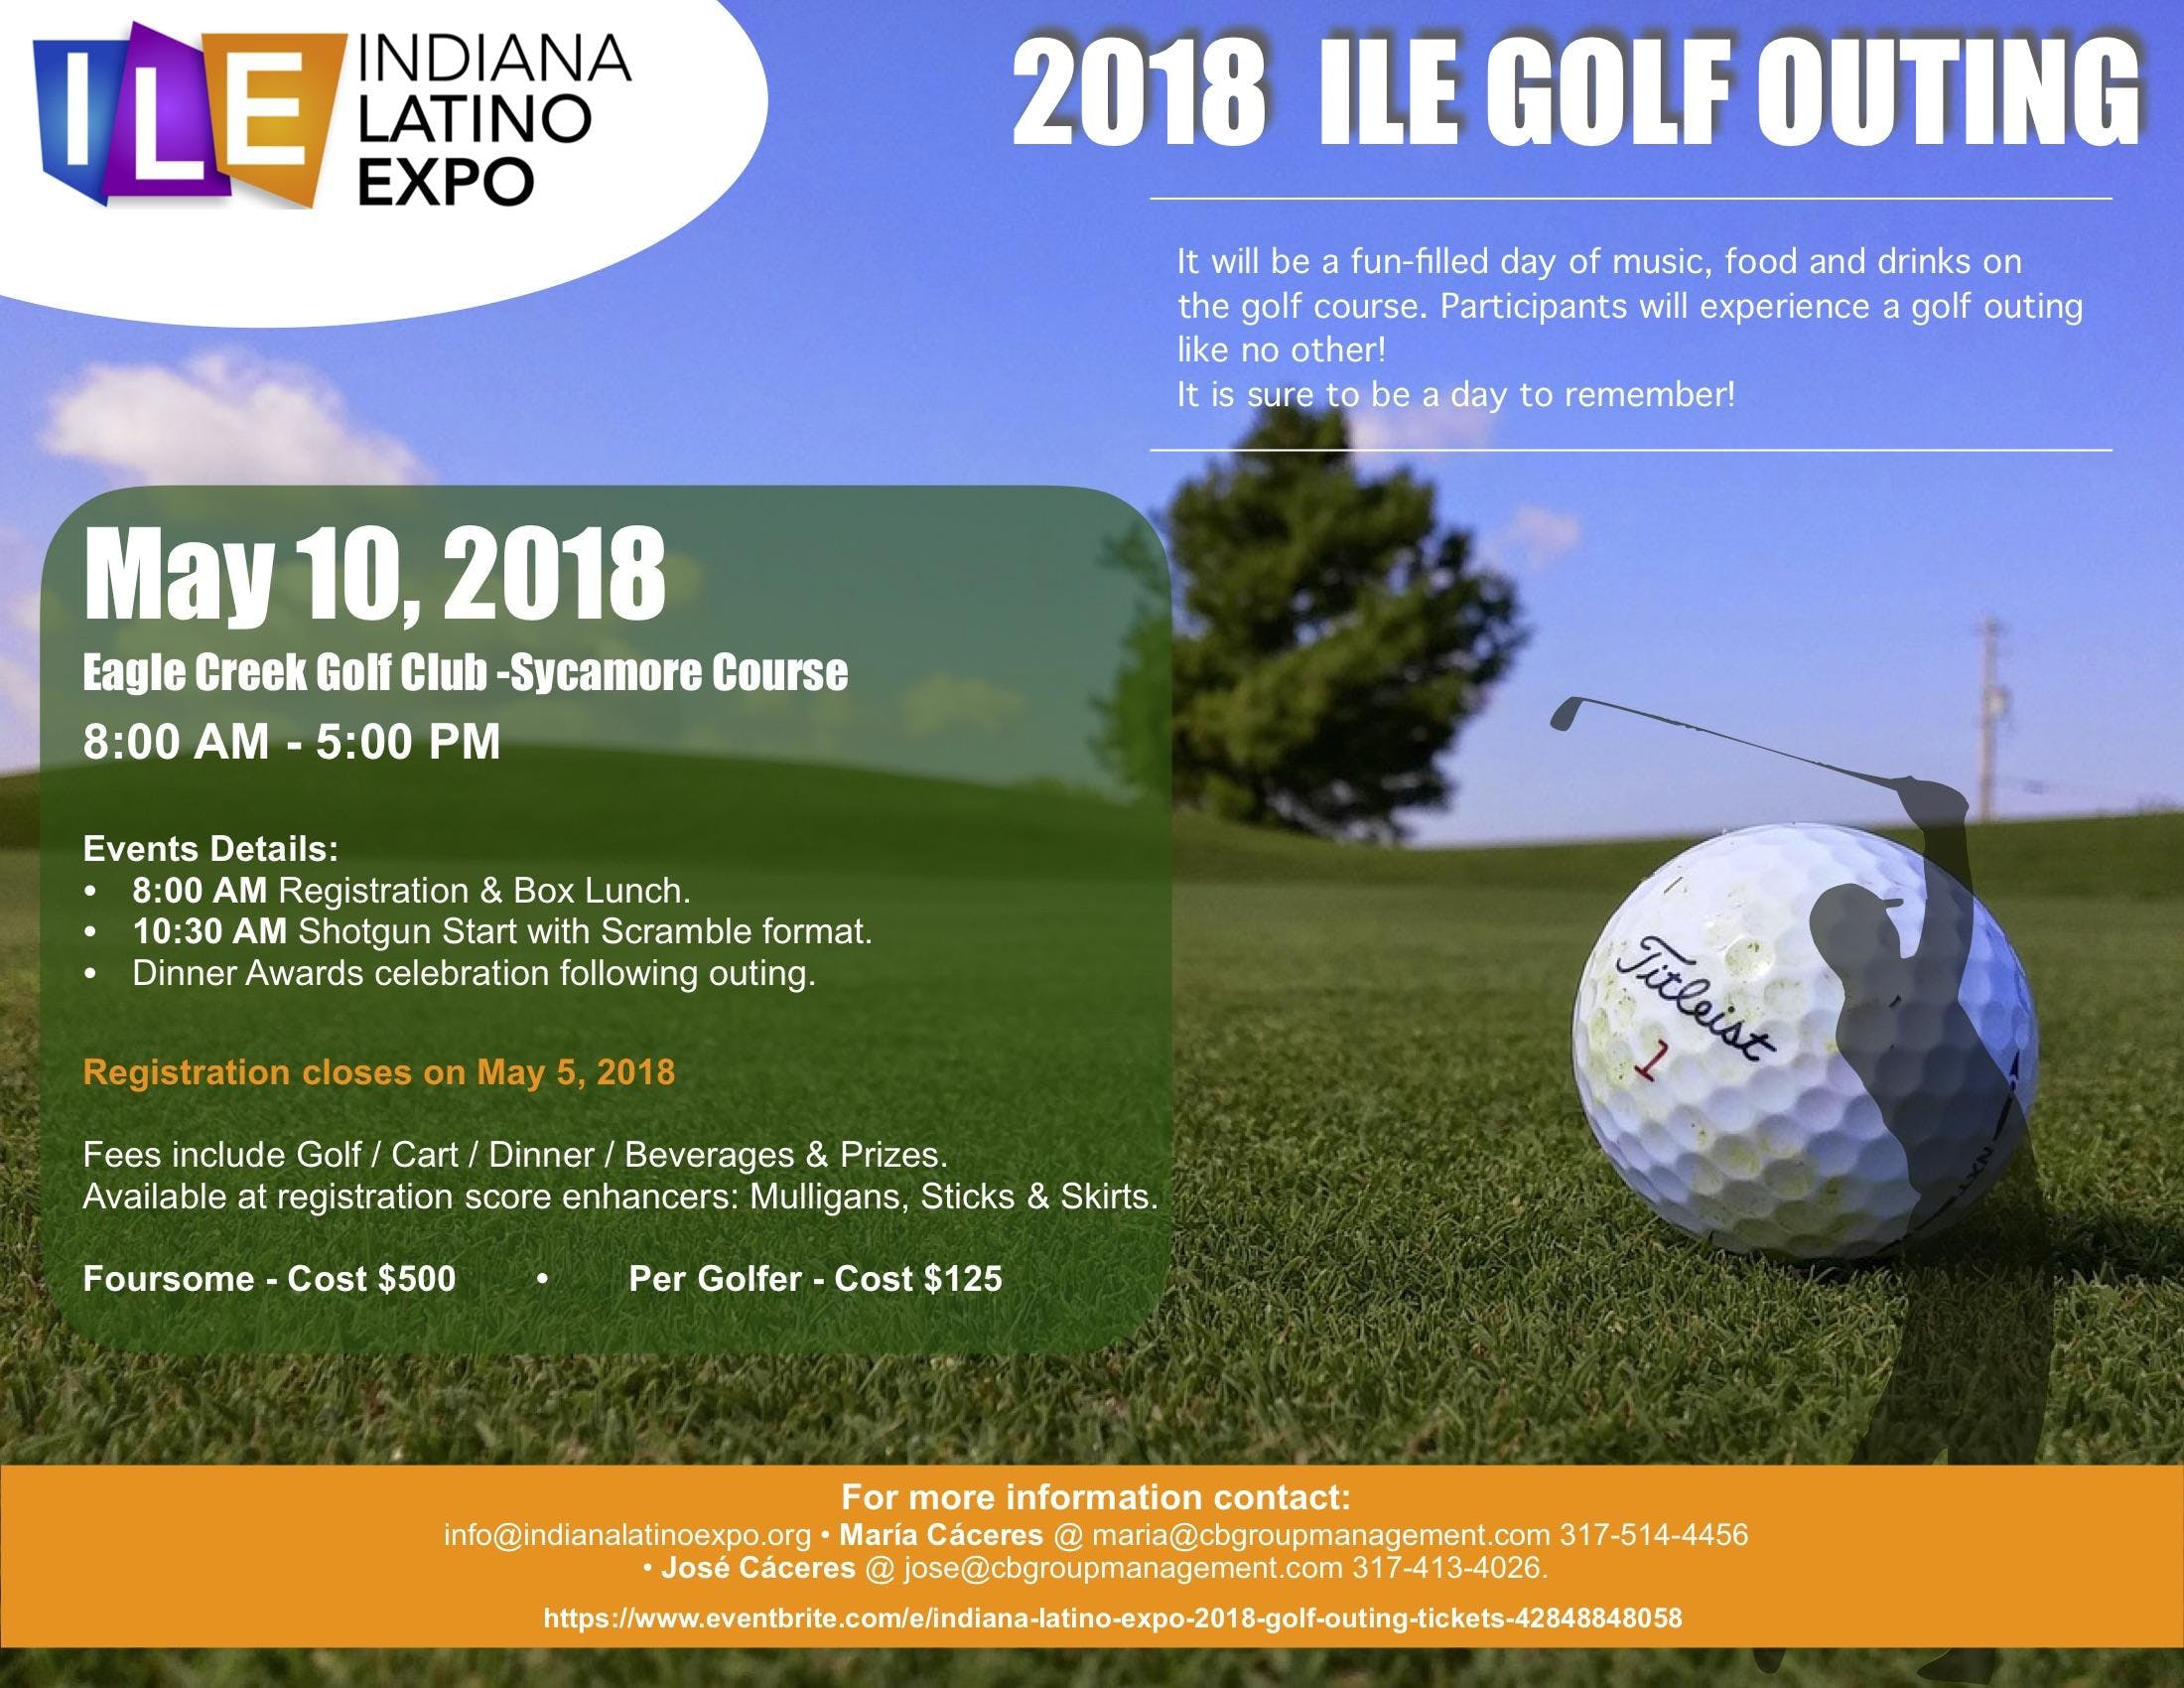 Indiana Latino Expo 2018 Golf Outing